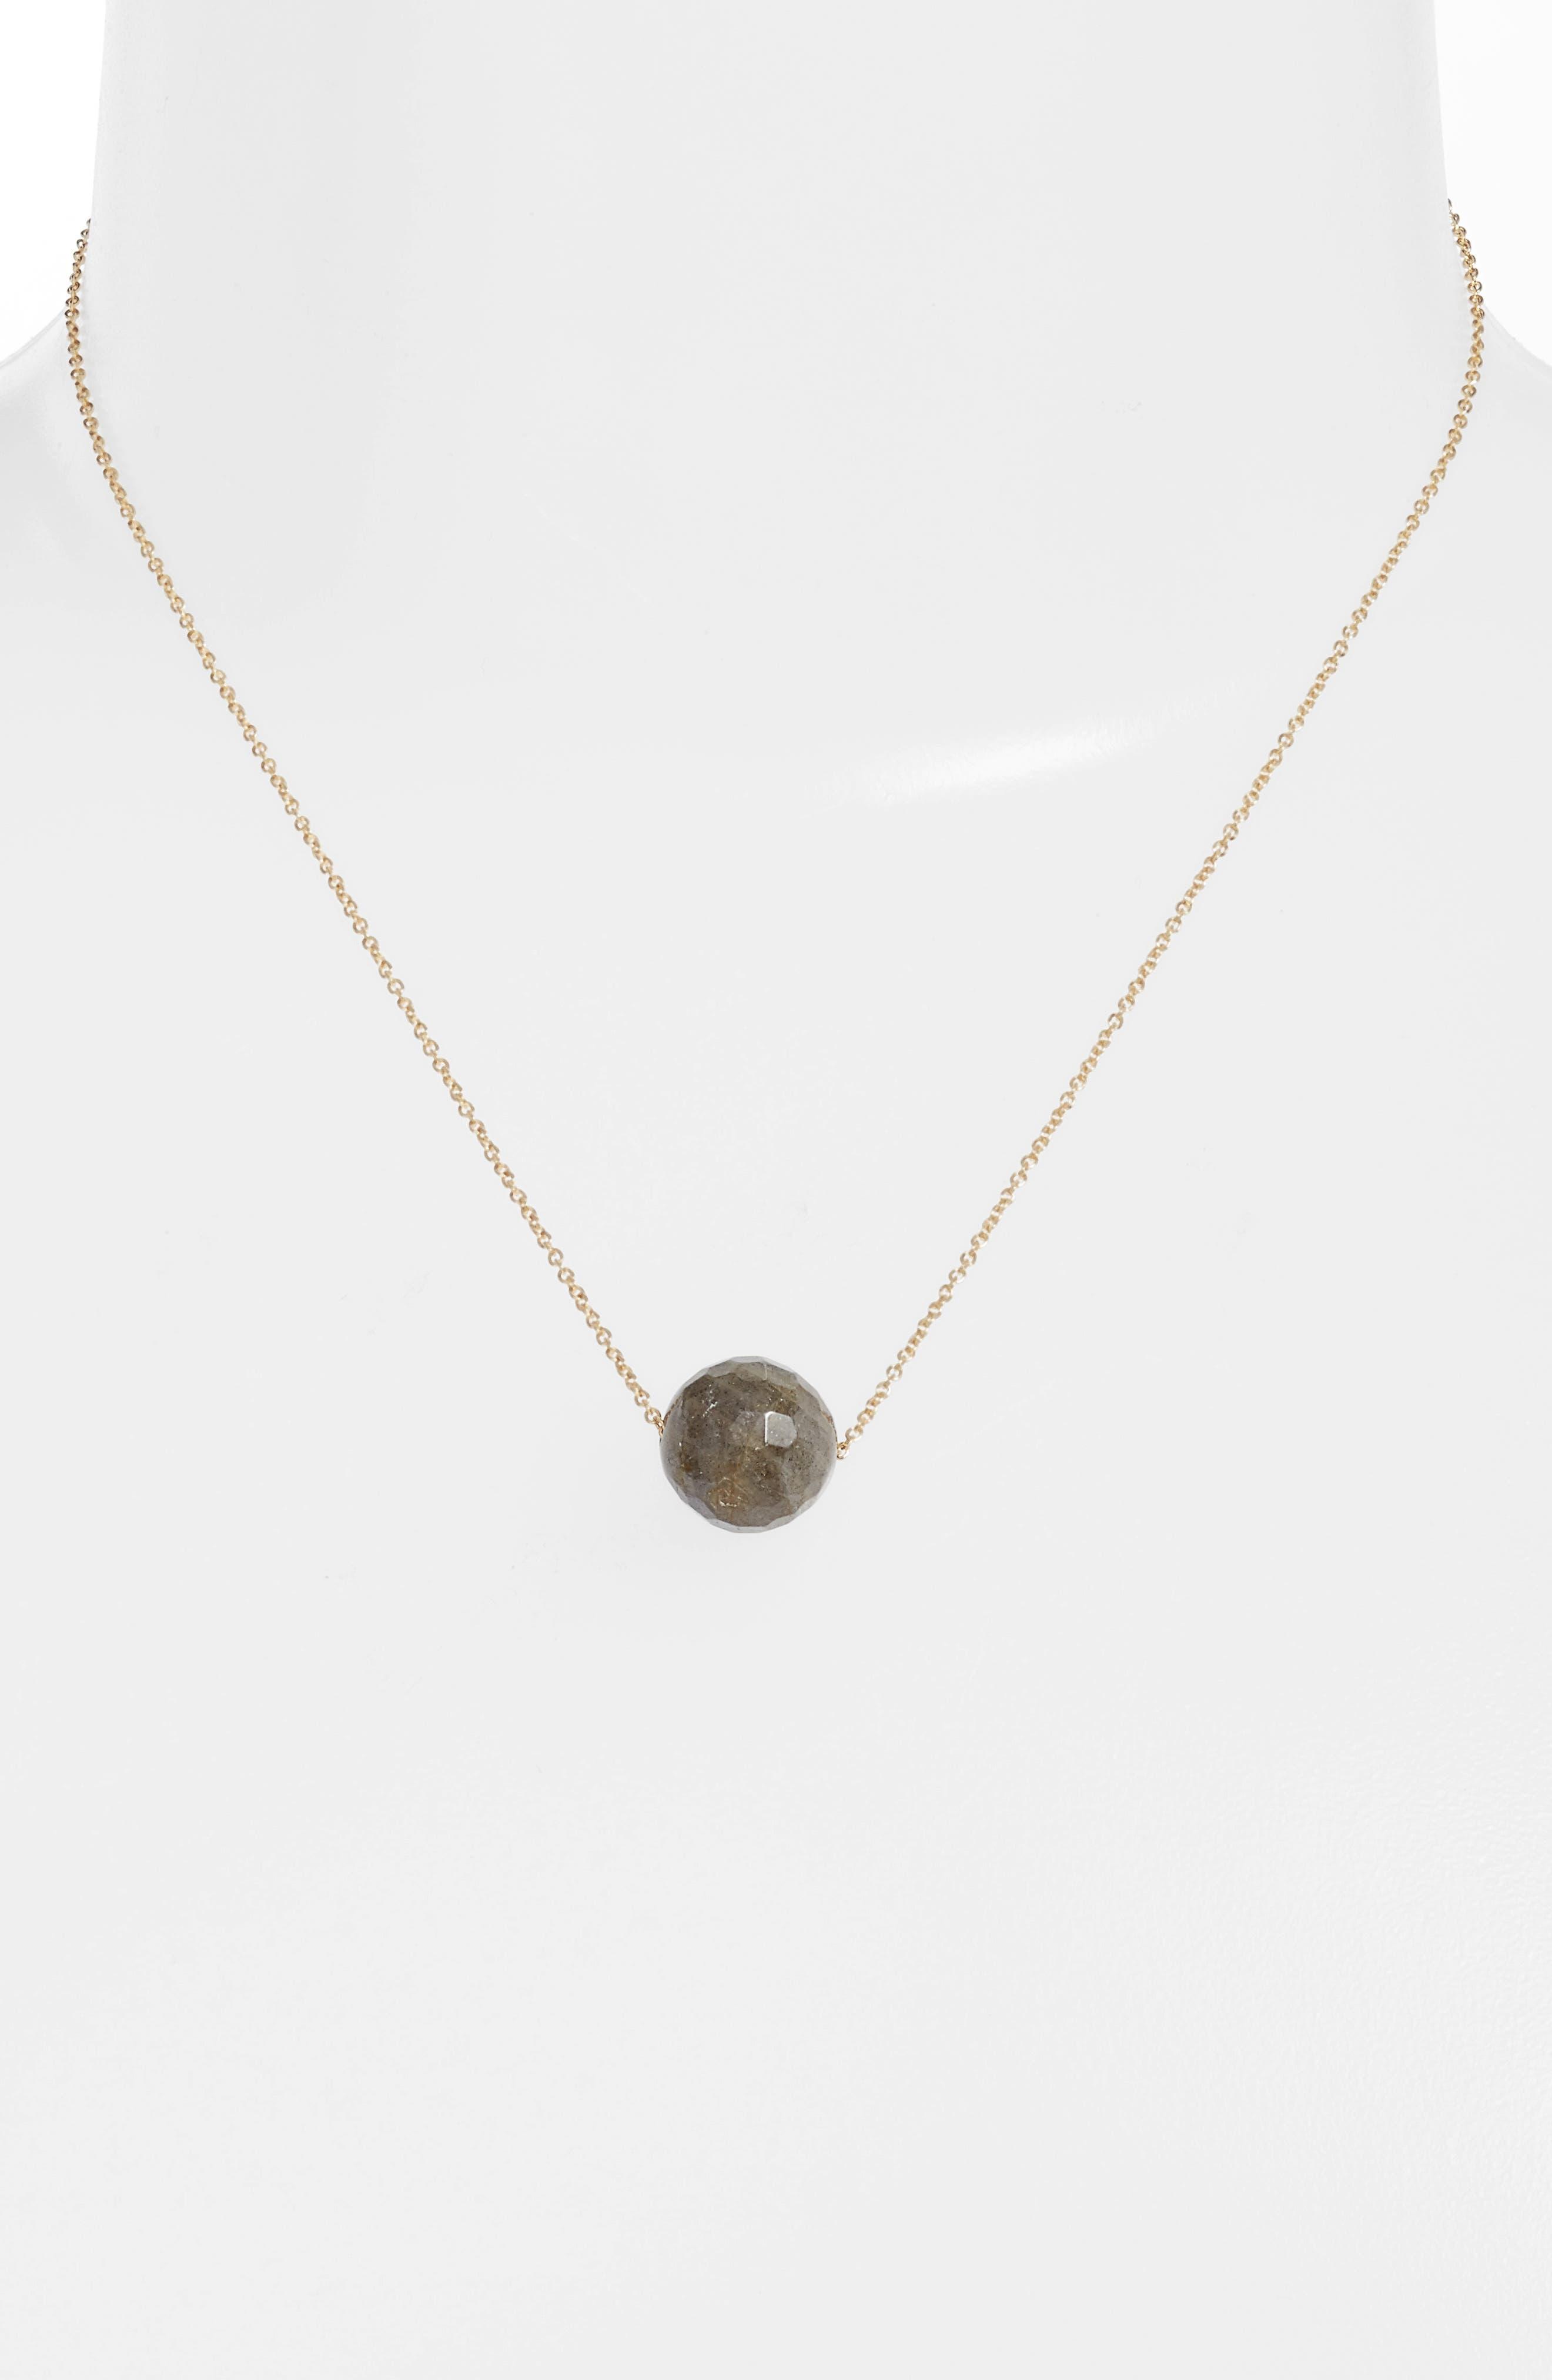 Power Gemstone Bead Adjustable Necklace,                             Alternate thumbnail 2, color,                             Labradorite/ Gold